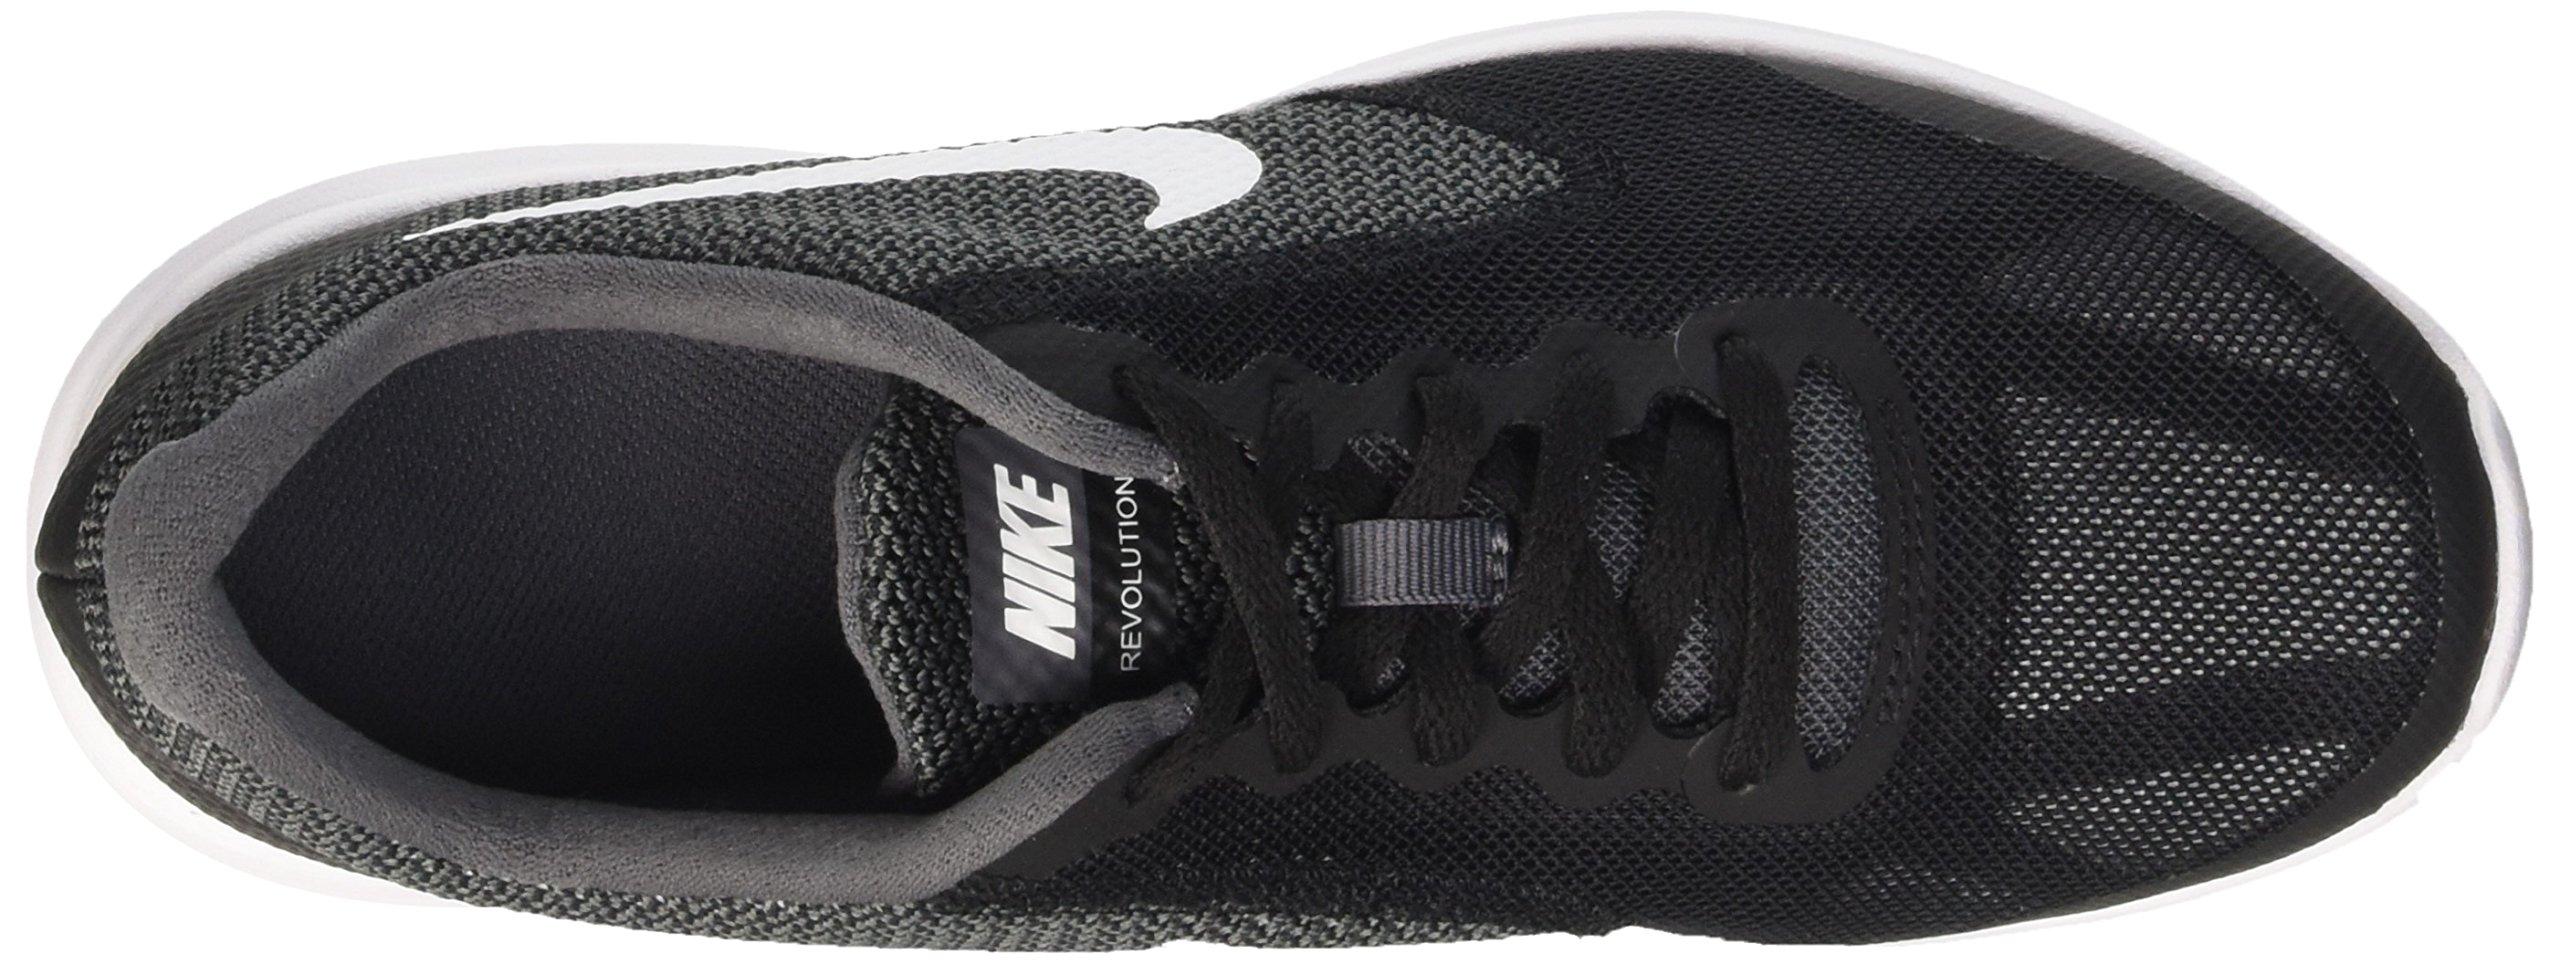 Nike Boys' Revolution 3 (GS) Running Shoe Dark Grey/White/Black/Pure Platinum 3.5 M US Big Kid by Nike (Image #7)